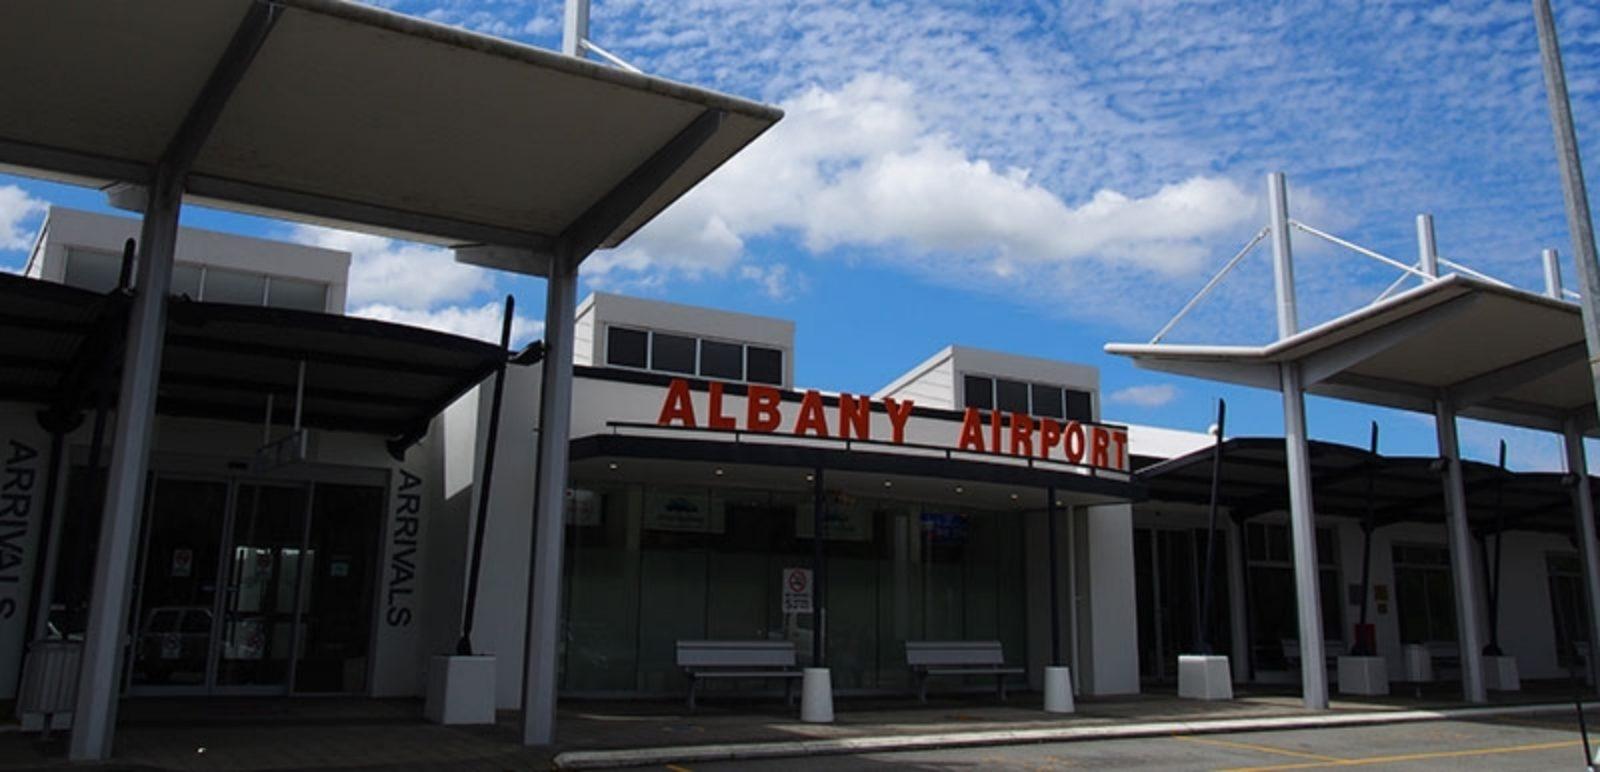 Albany Regional Airport, Albany, Western Australia